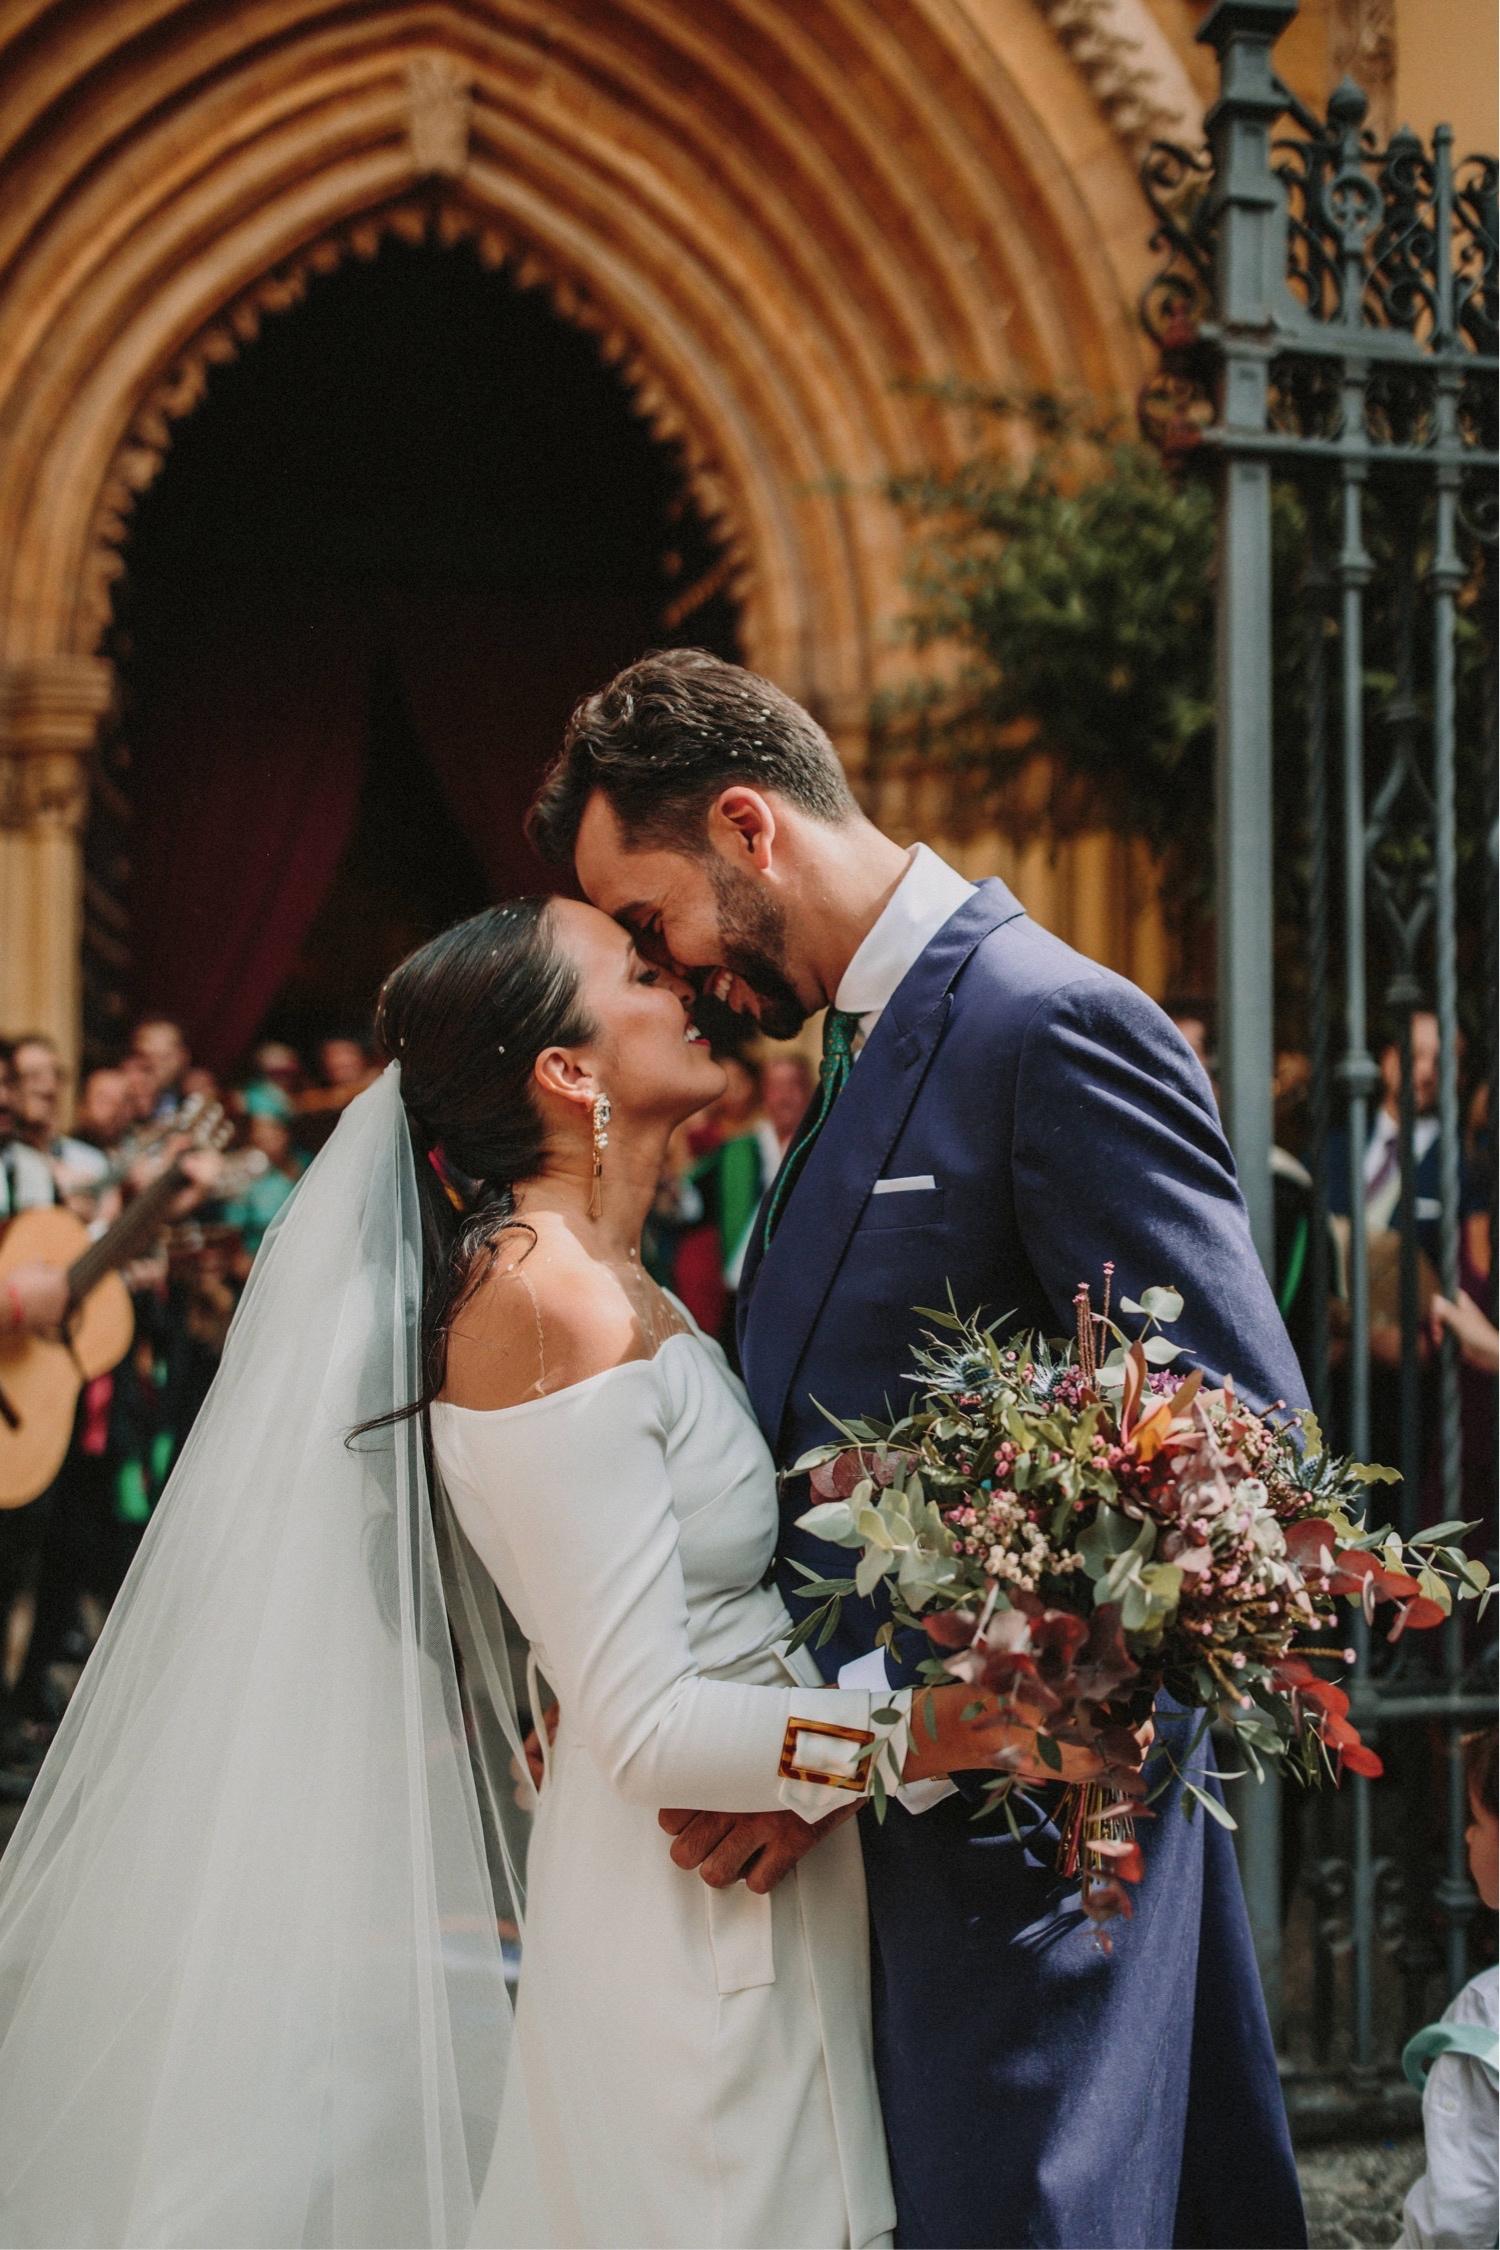 32_wedding-ernestovillalba-anabel-diego-2558-ASE.jpg